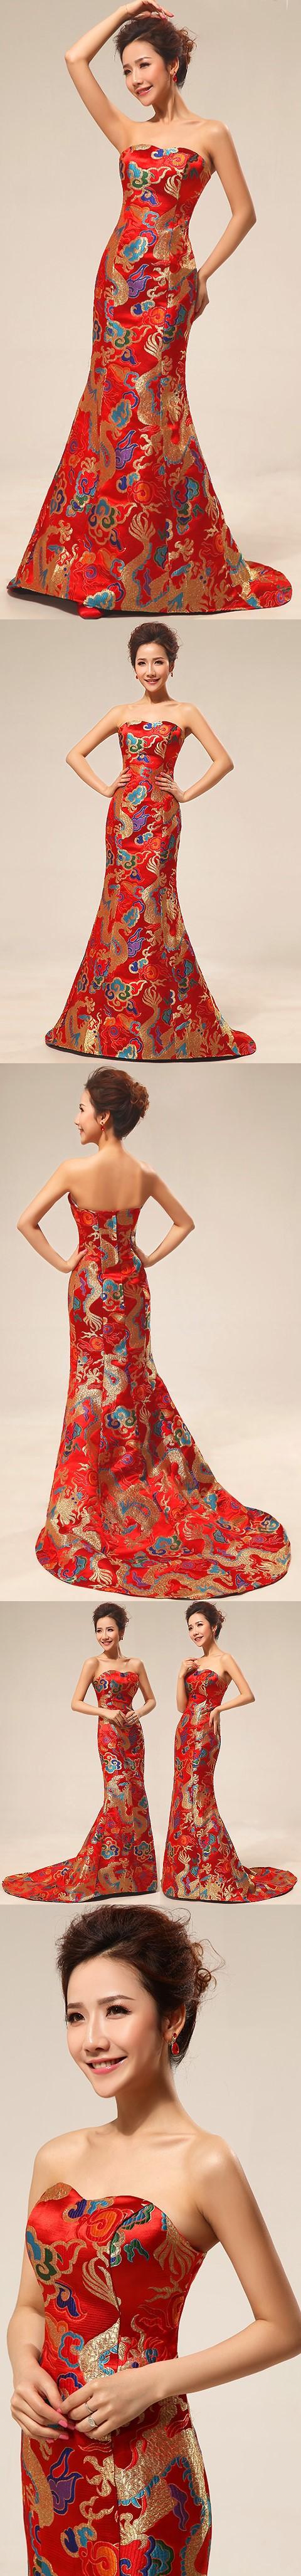 Bare-shoulders Dragon Robe Prom Dress (RM)